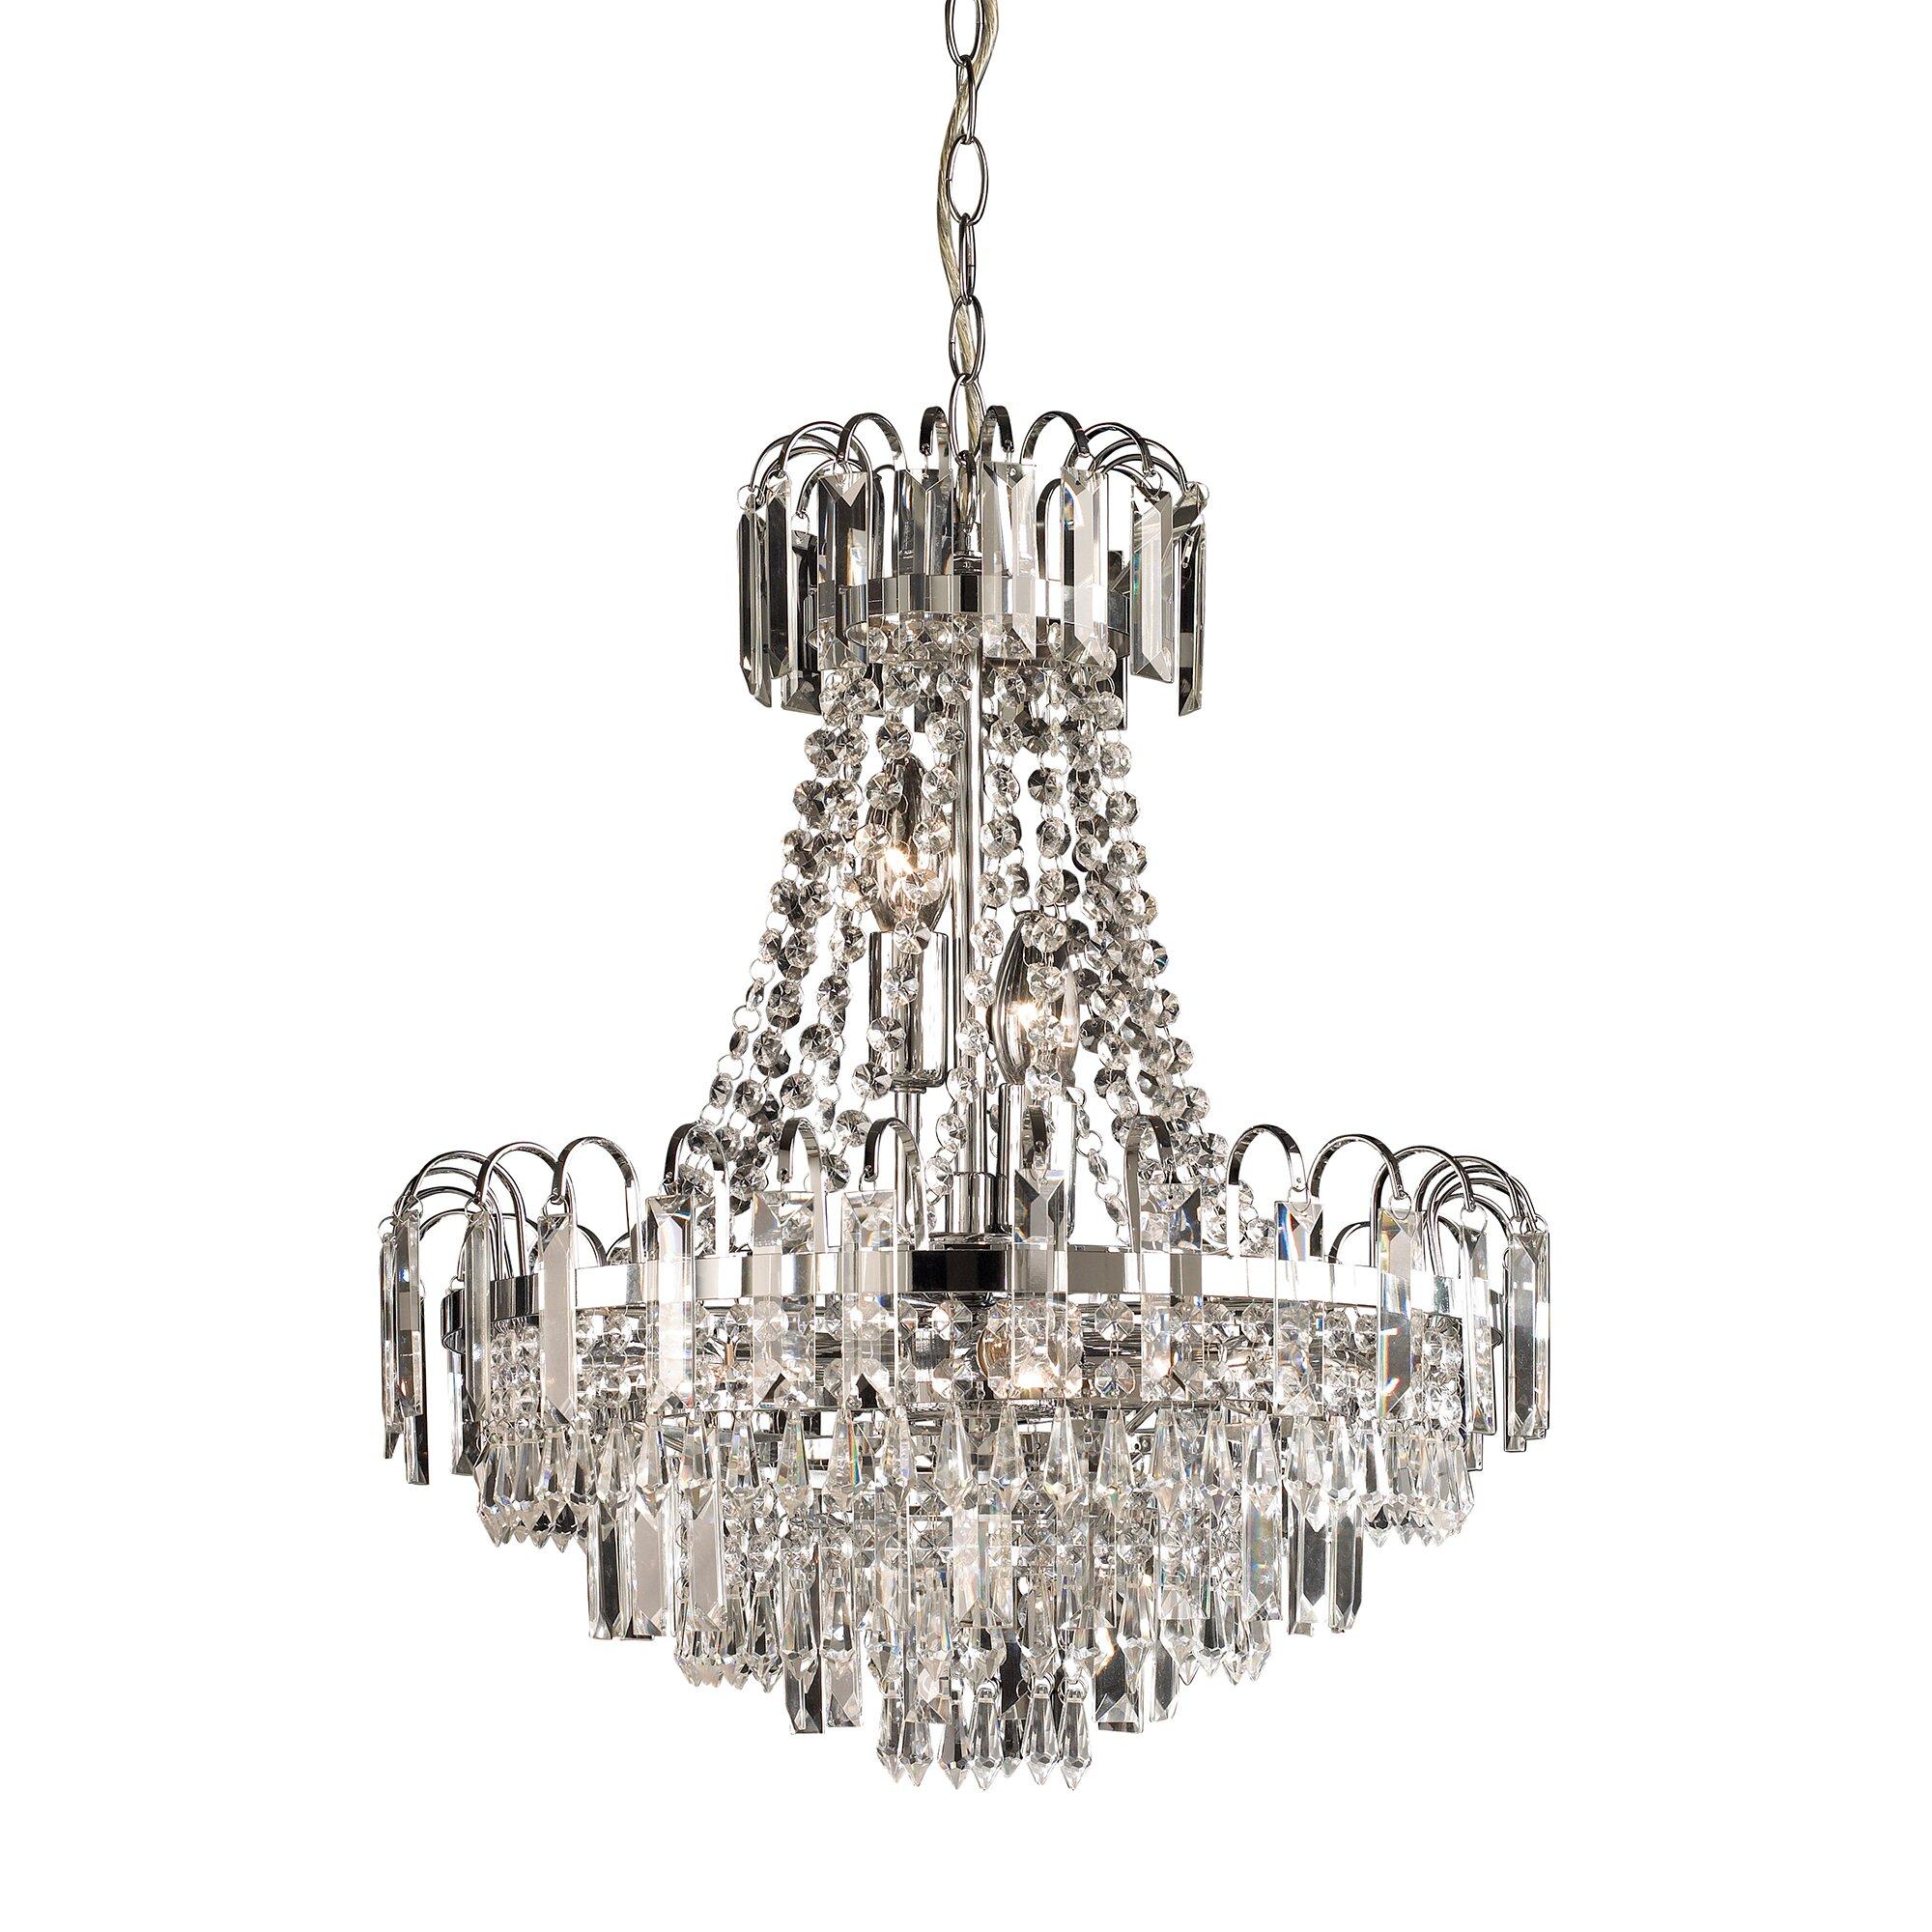 Endon lighting amadis 6 light crystal chandelier reviews for 6 light crystal chandelier